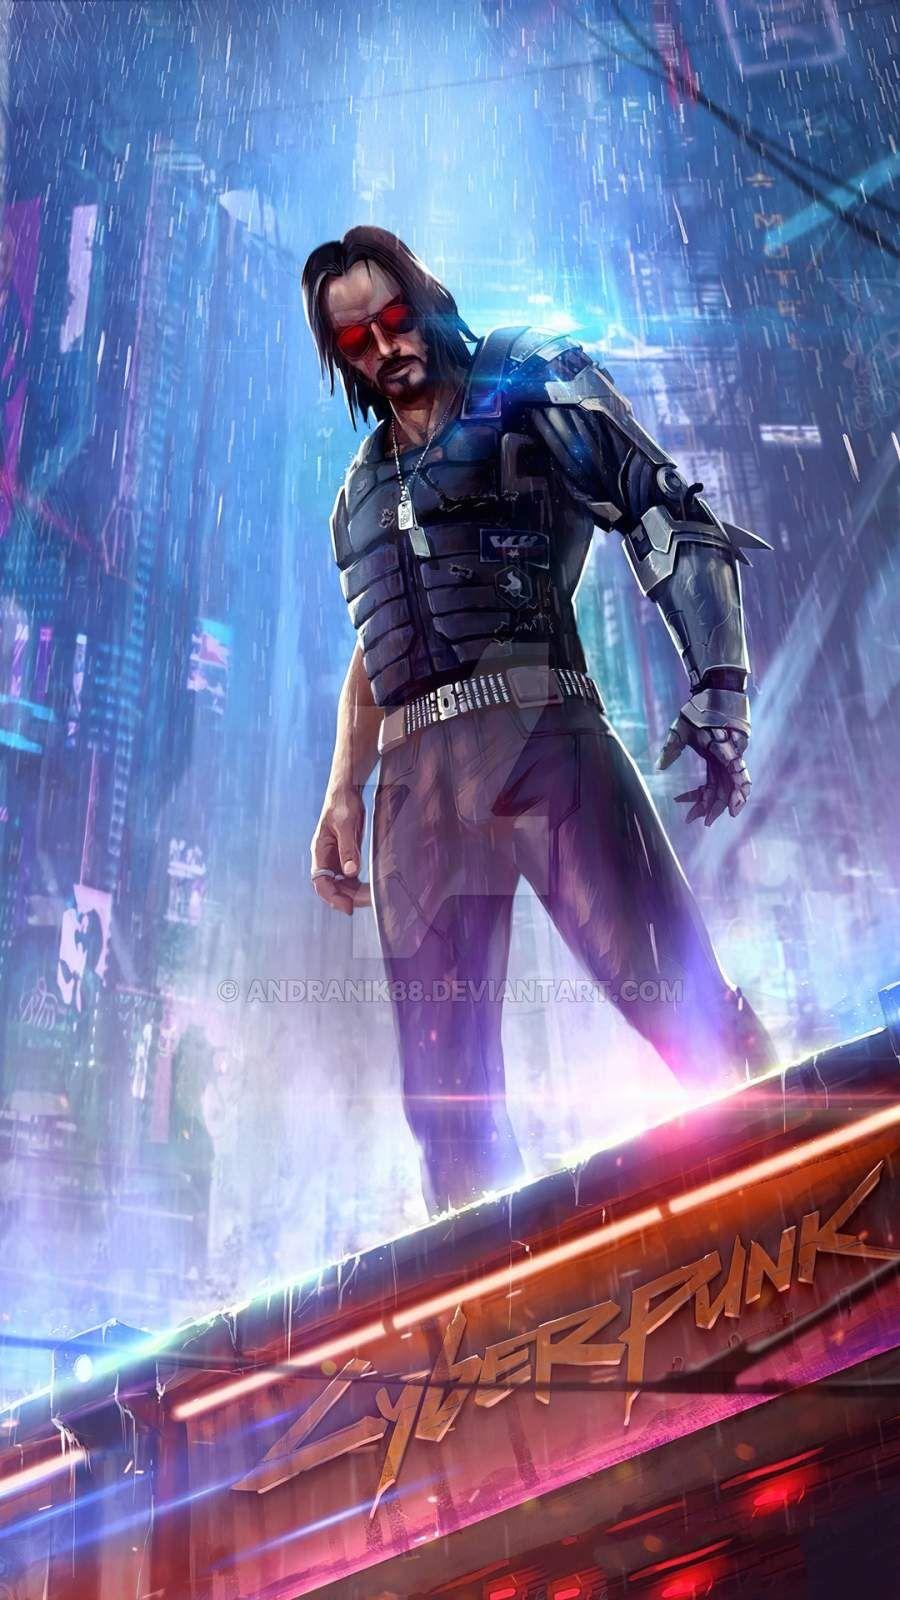 Cyberpunk 2077 Keanu Iphone Wallpaper Cyberpunk 2077 Cyberpunk Cyberpunk Aesthetic